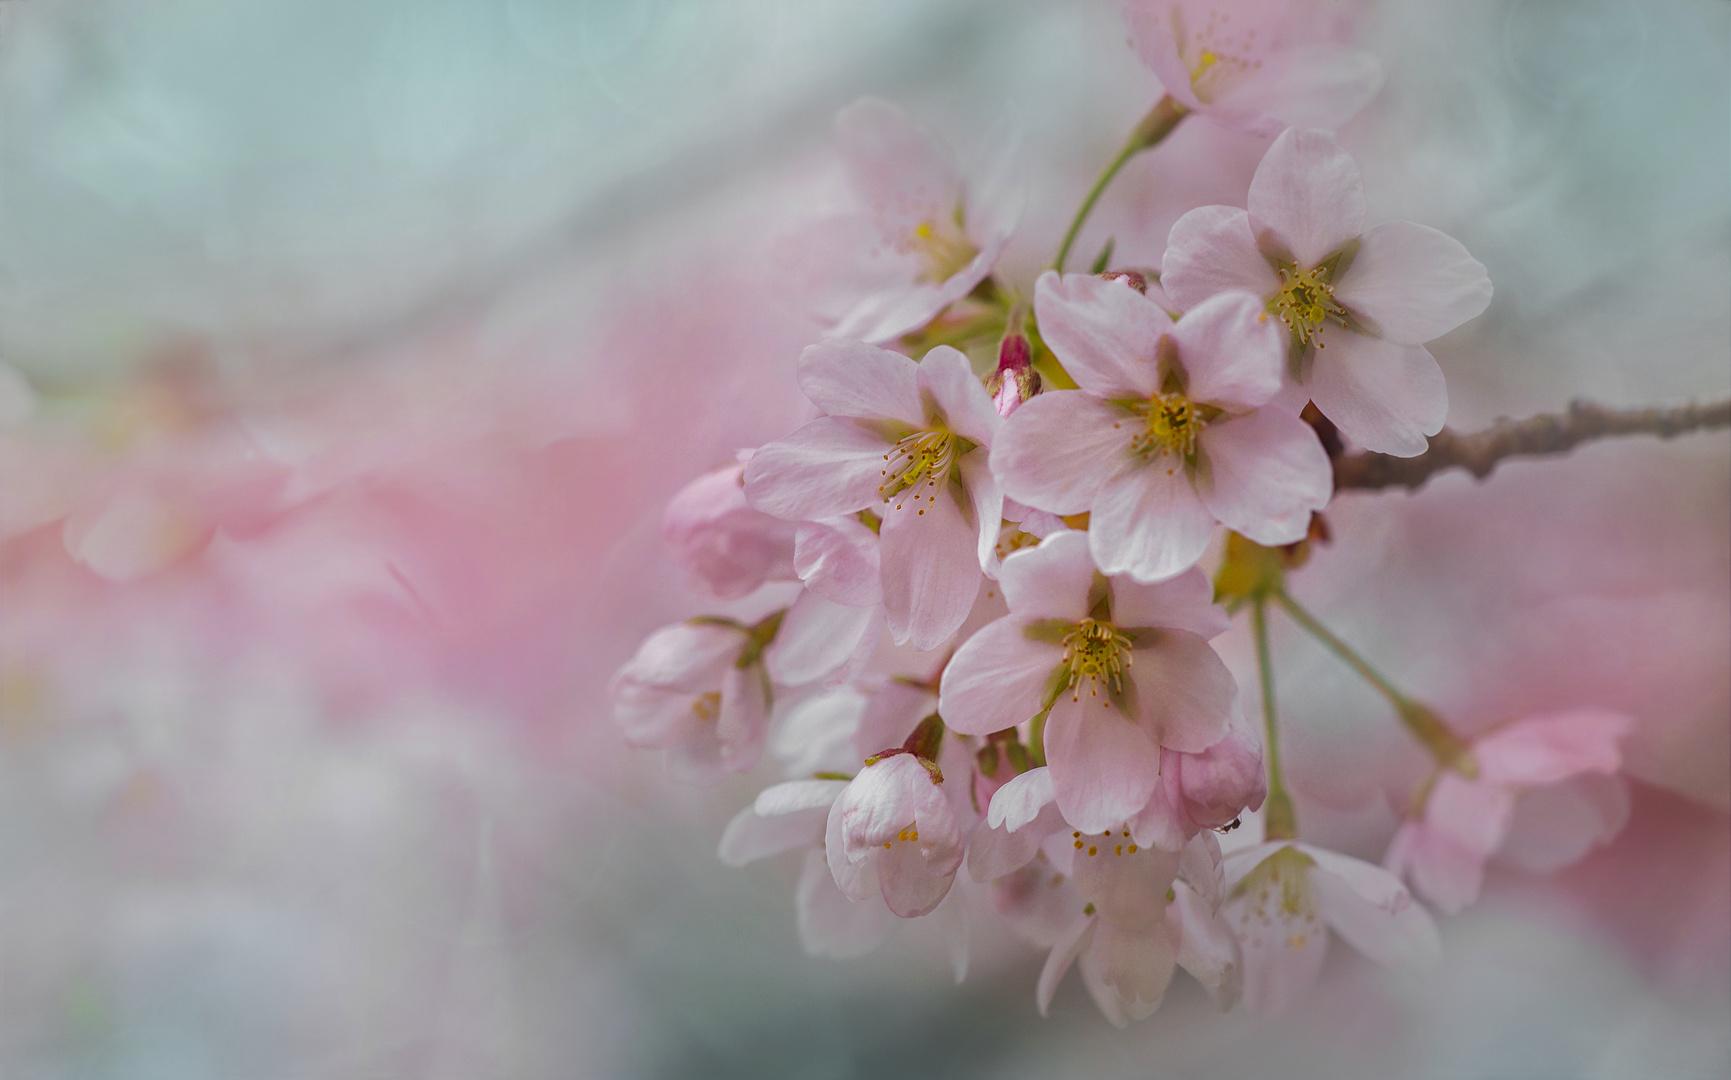 Viele kleine Frühlingsblüten